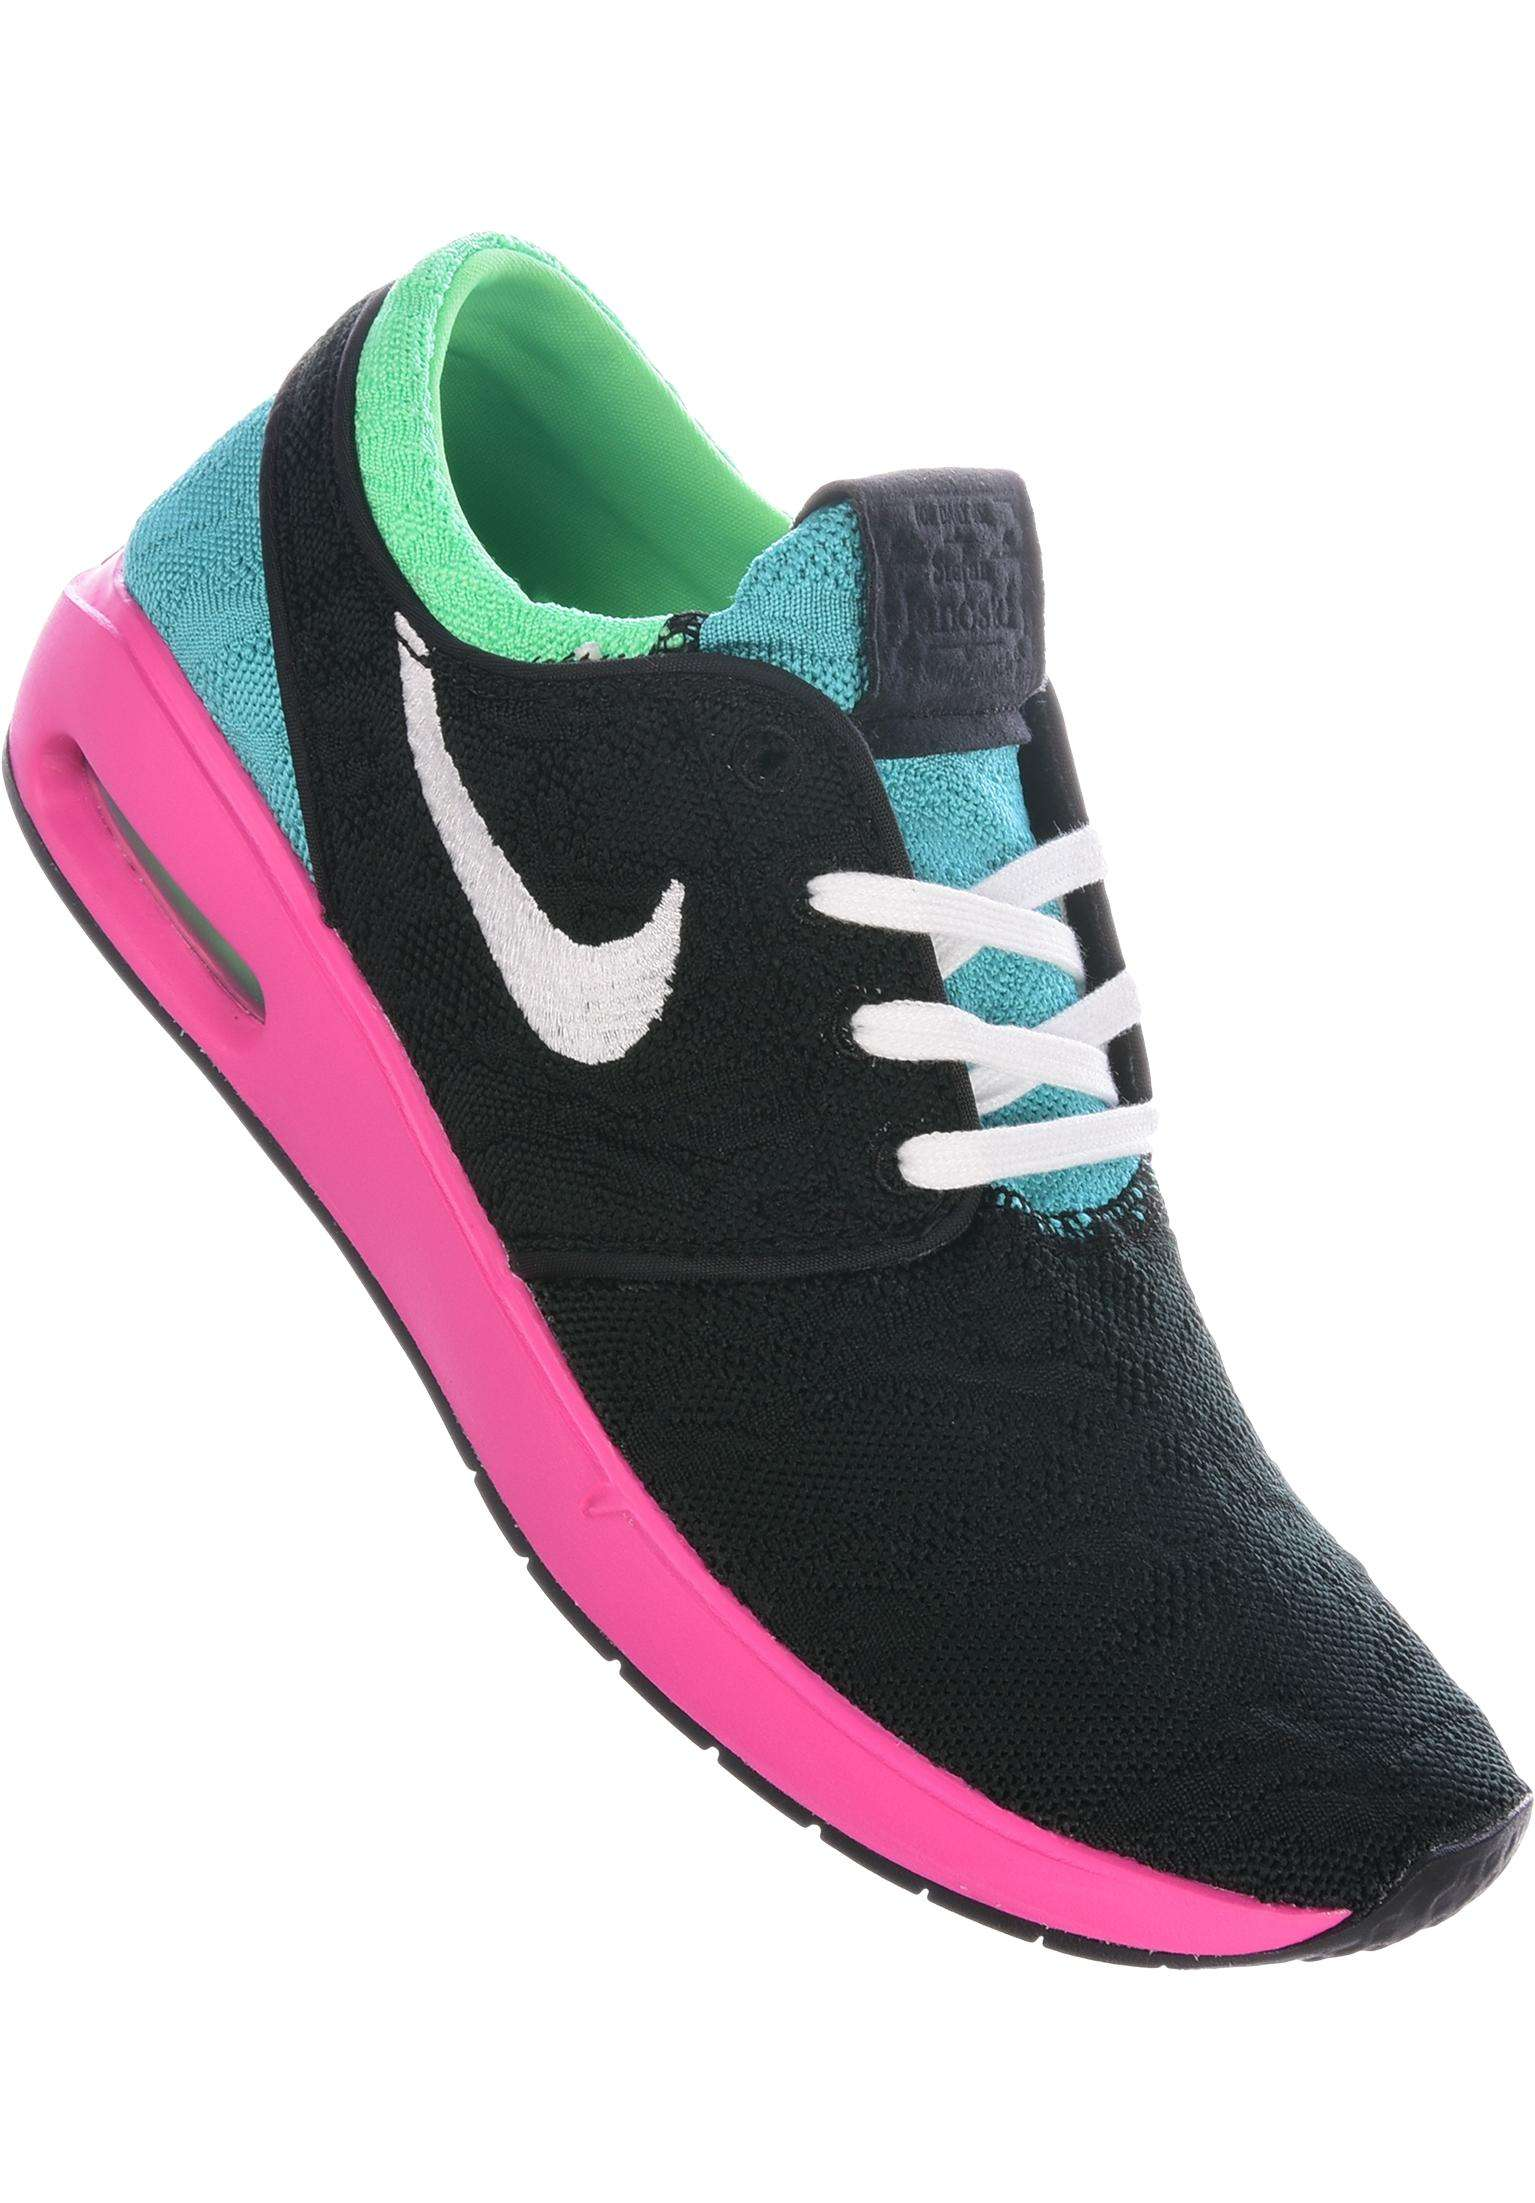 e954b71756 Air Max Janoski 2 Nike SB Alle Schuhe in black-white-multi für Herren    Titus